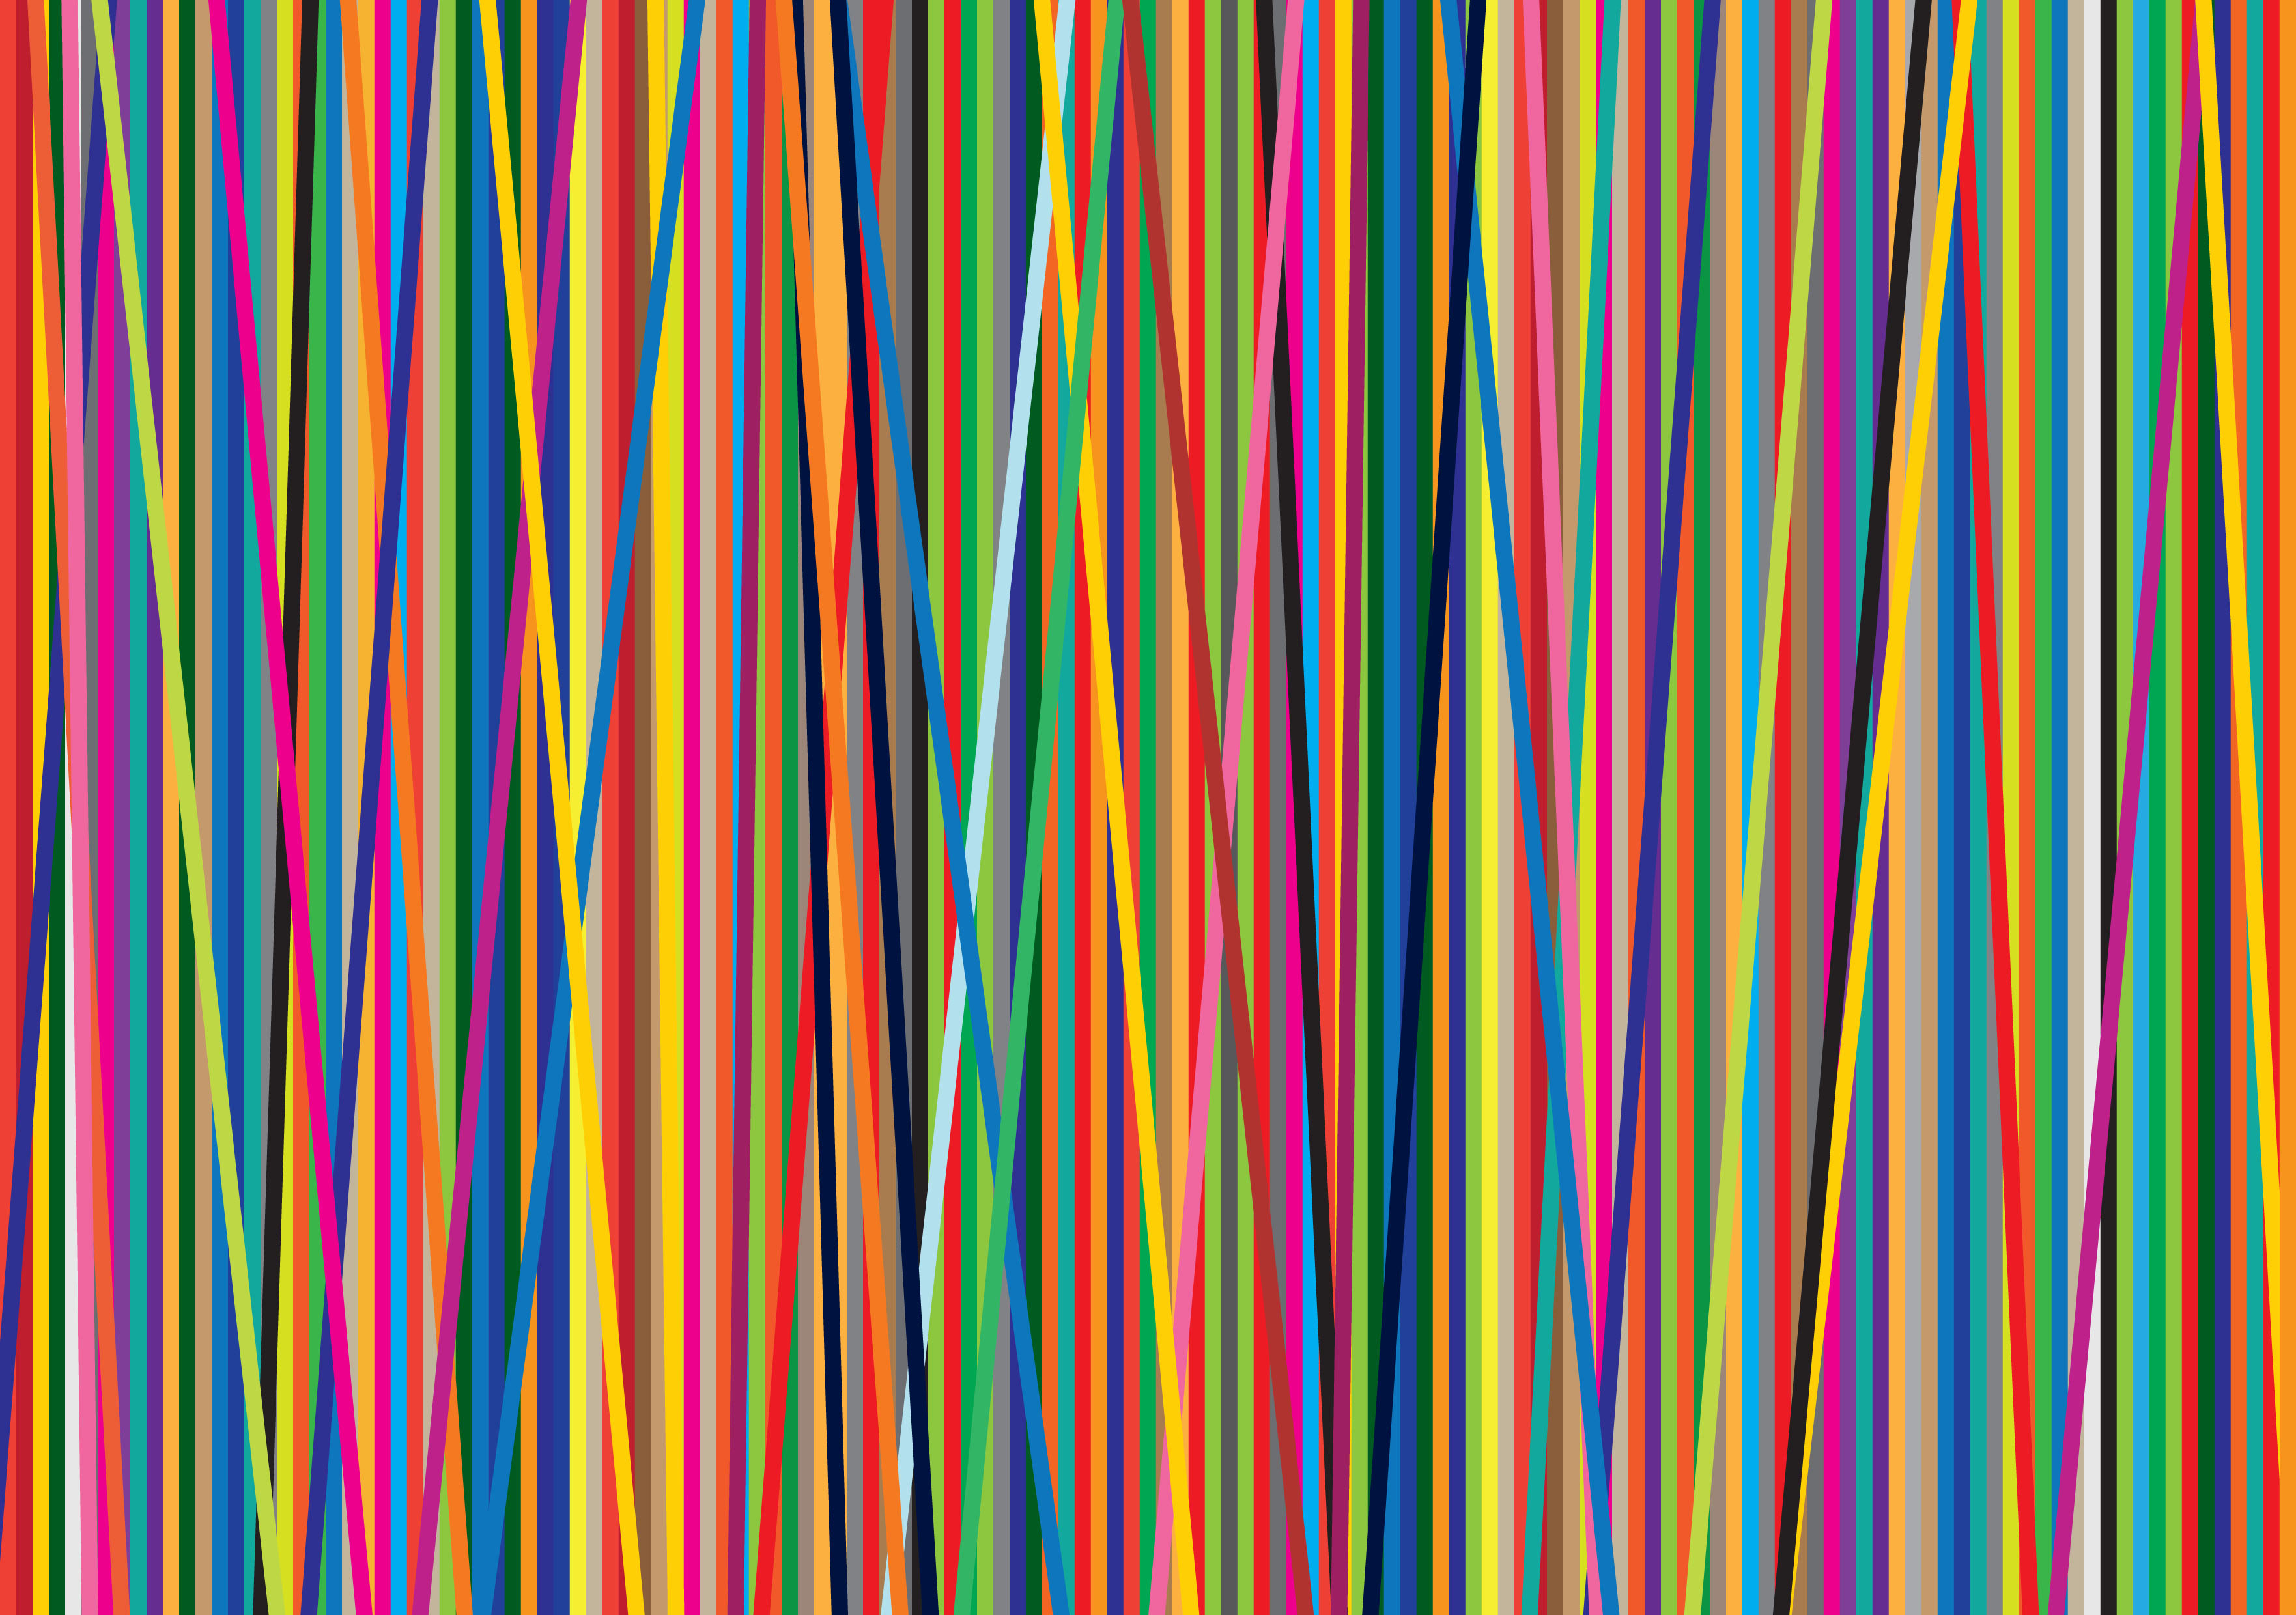 zebra wallpaper modern silverware wallpaper 3525x2480